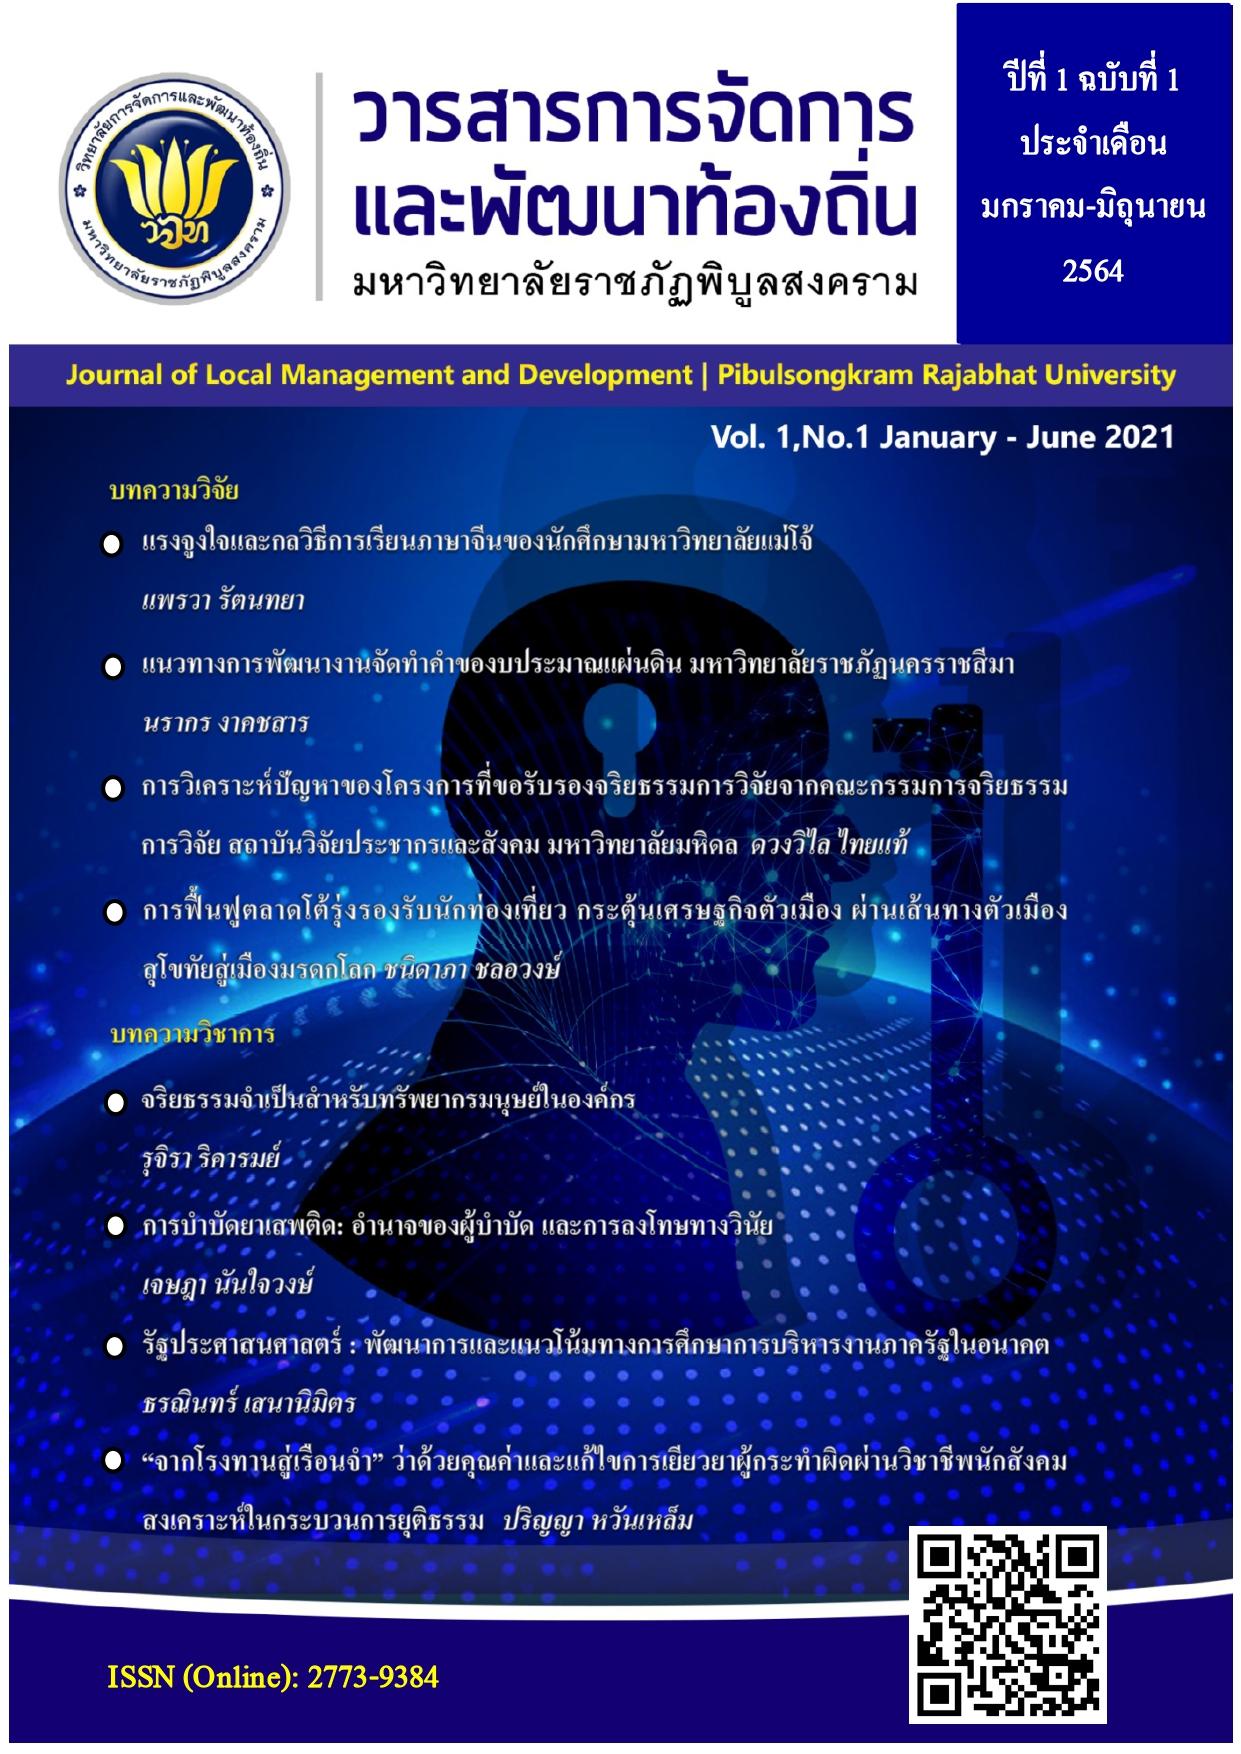 Journal of Local Management and Development Pibulsongkram Rajabhat University Vol 1 No 1 2021